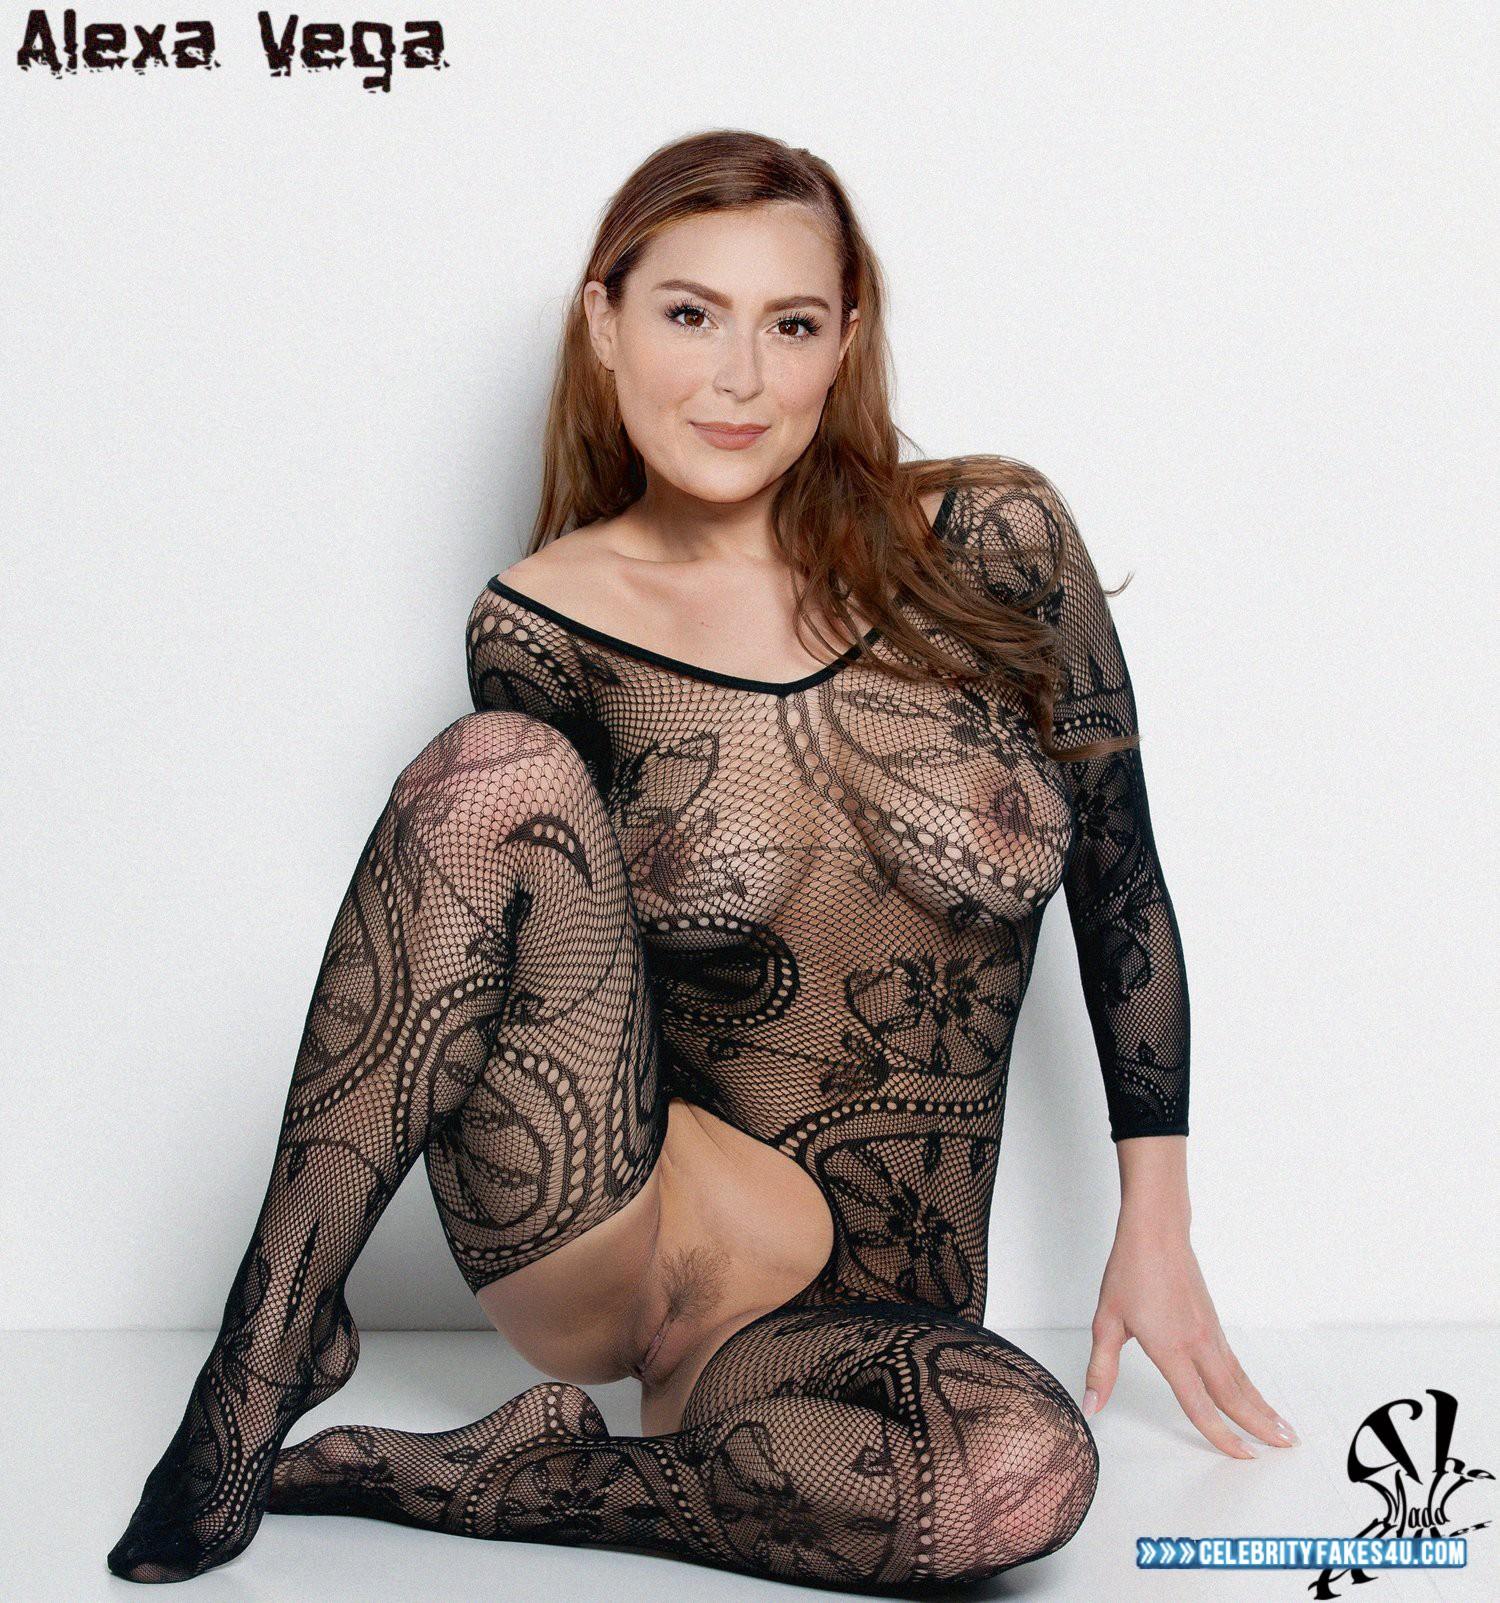 Alex vega naked fakes